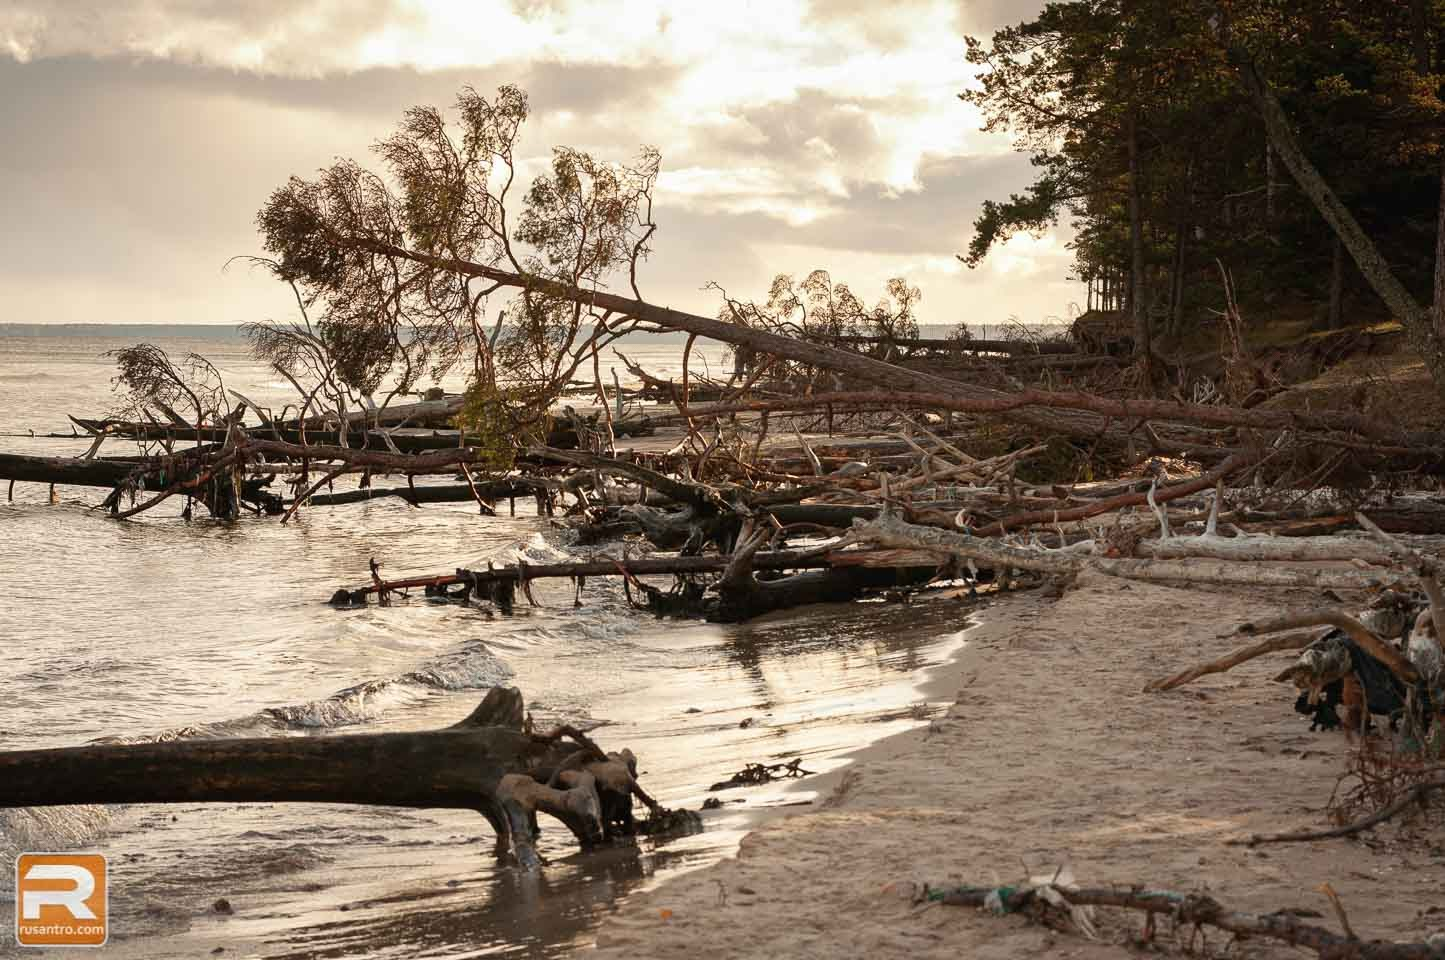 Jūras izskalotie koki